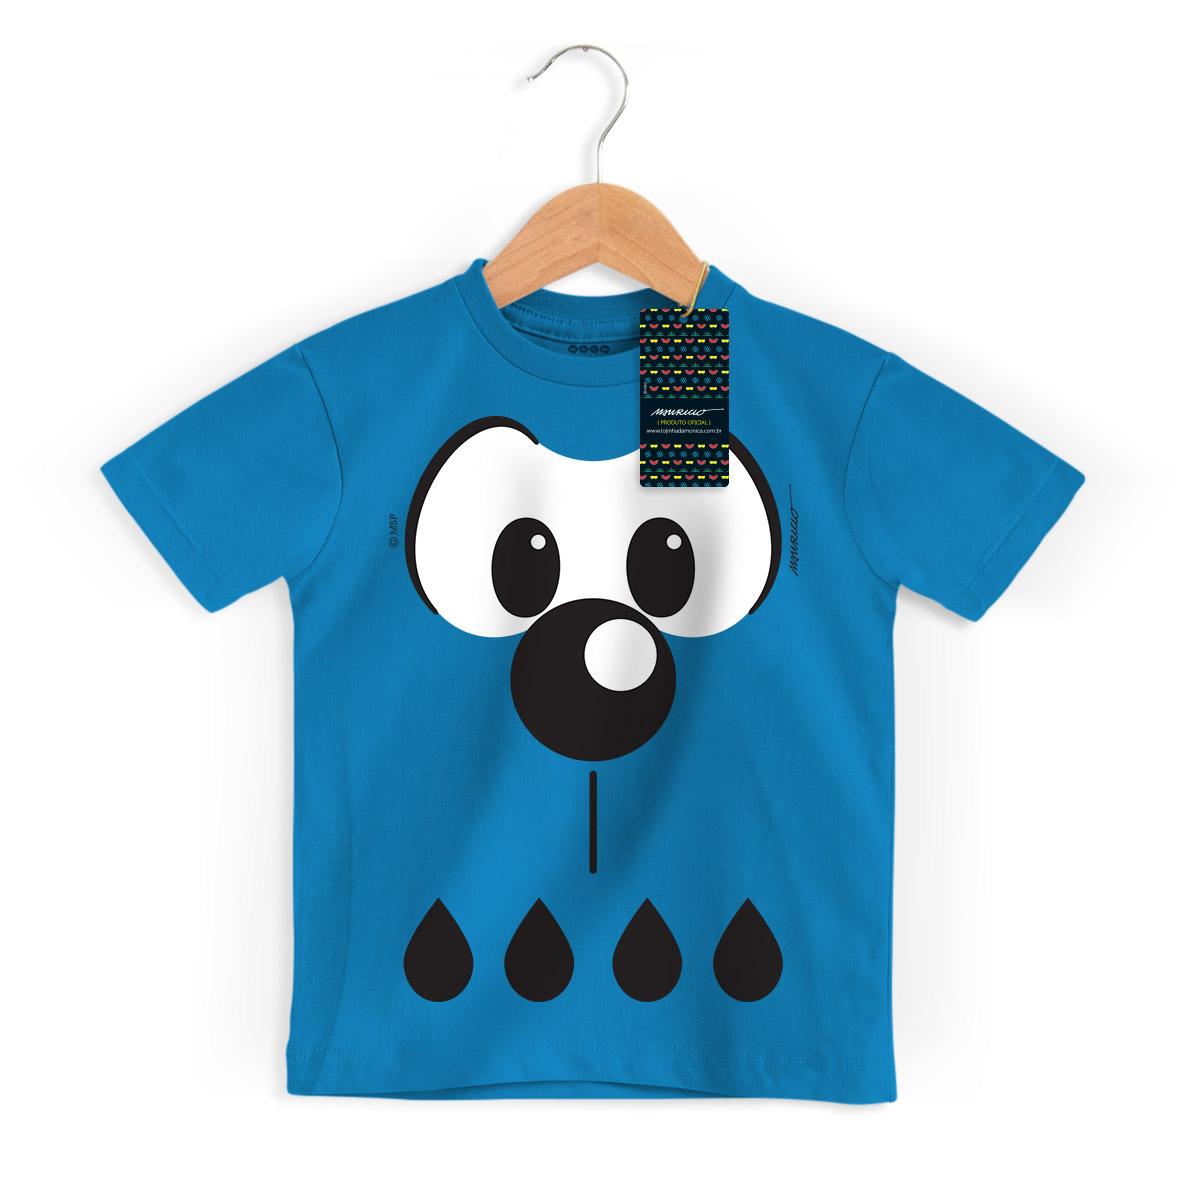 Camiseta Infantil Turma Da M�nica Kids Olh�es Bidu